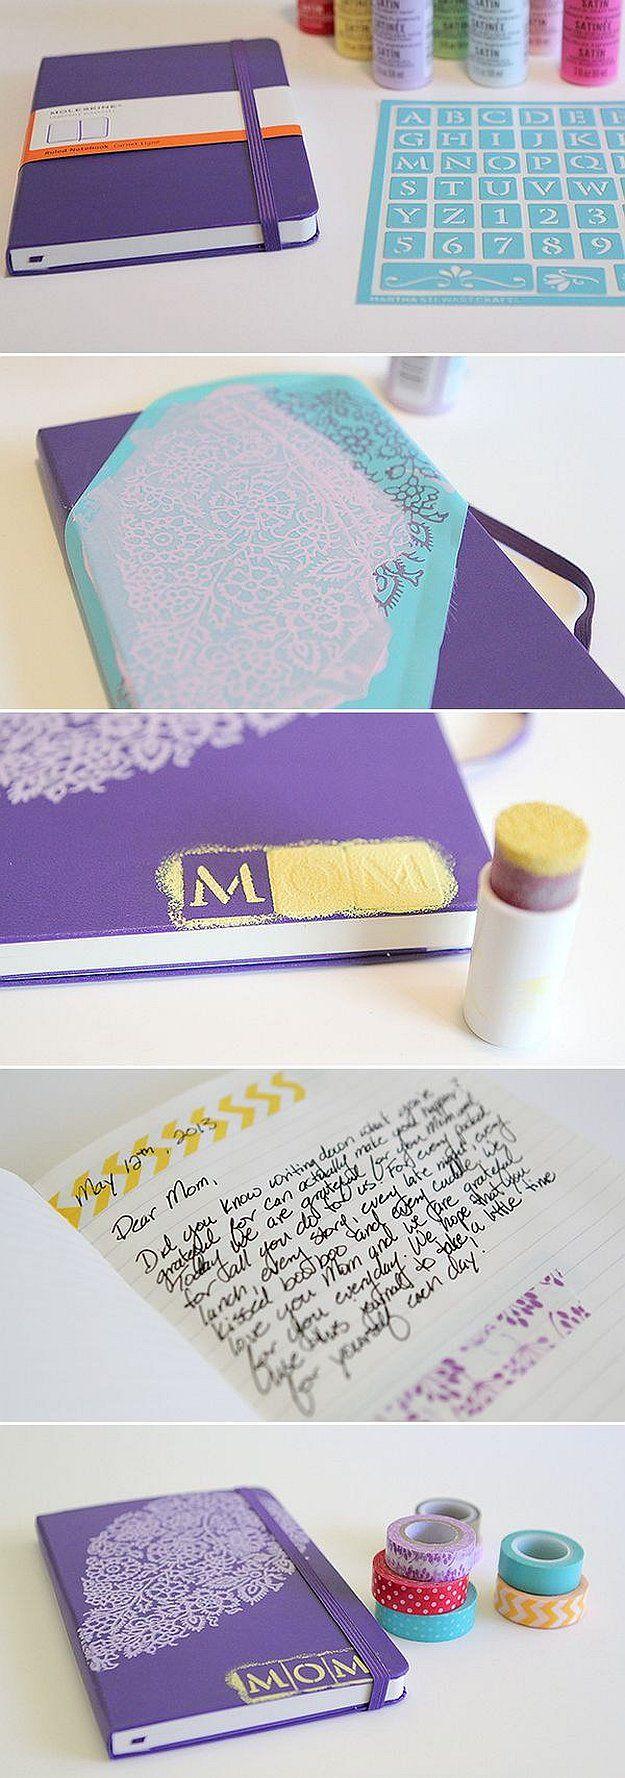 10 DIY Birthday Gift Ideas for Mom Diy birthday gifts